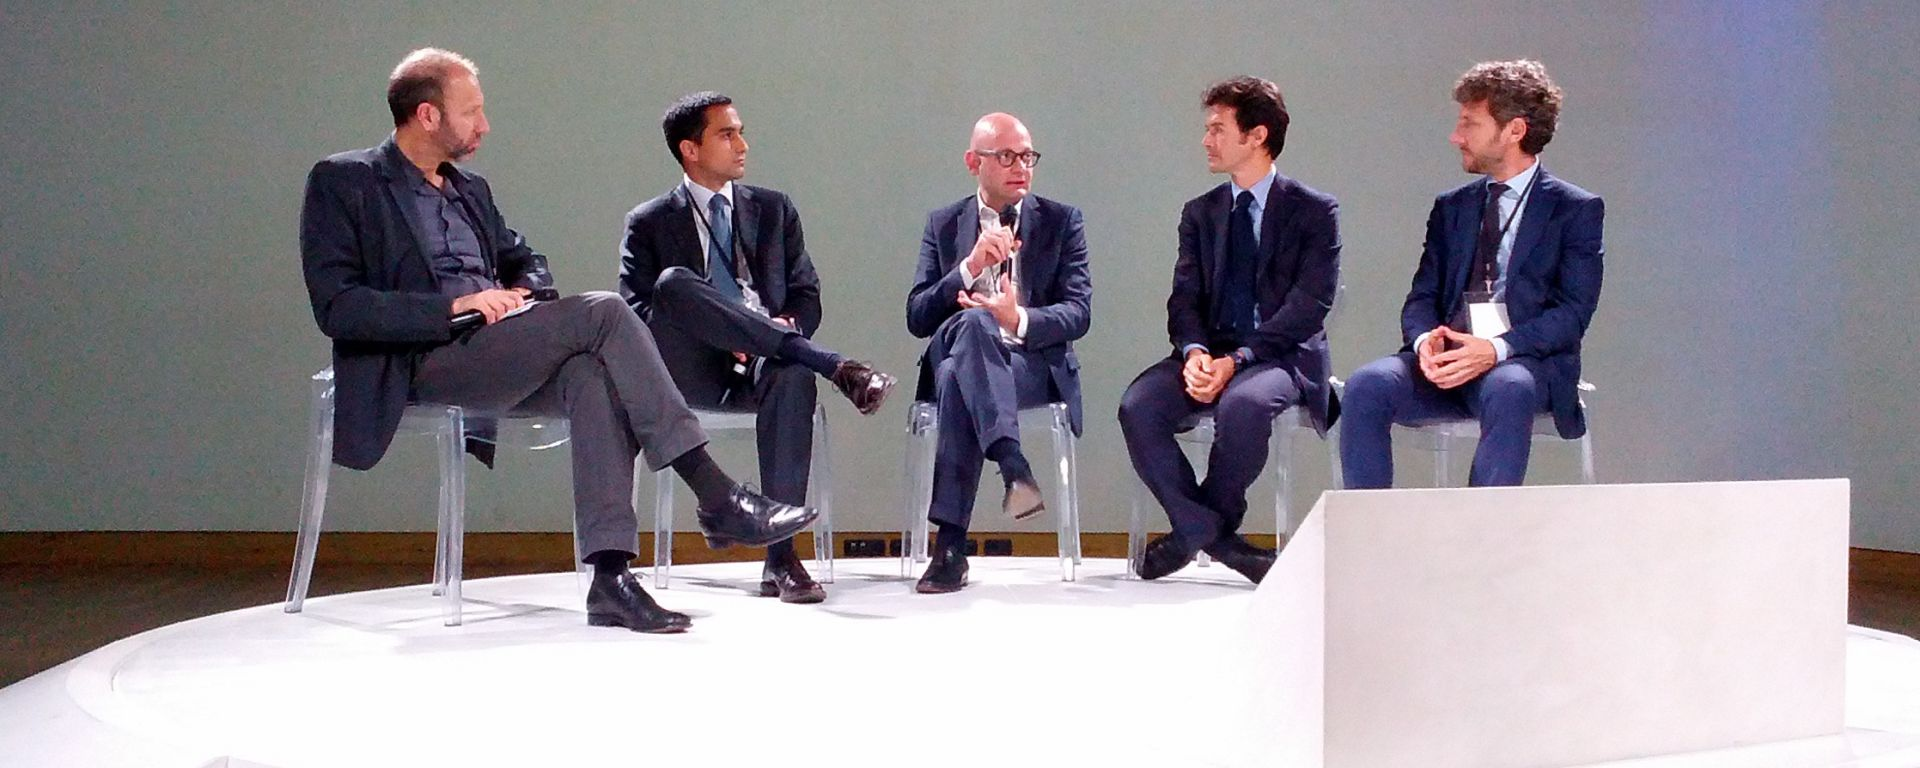 Disruptive Week Closing Talk: da sinistra G. Rusconi, G. Di Loreto, P. Lanzoni, A. Jurkic, A. Leverano